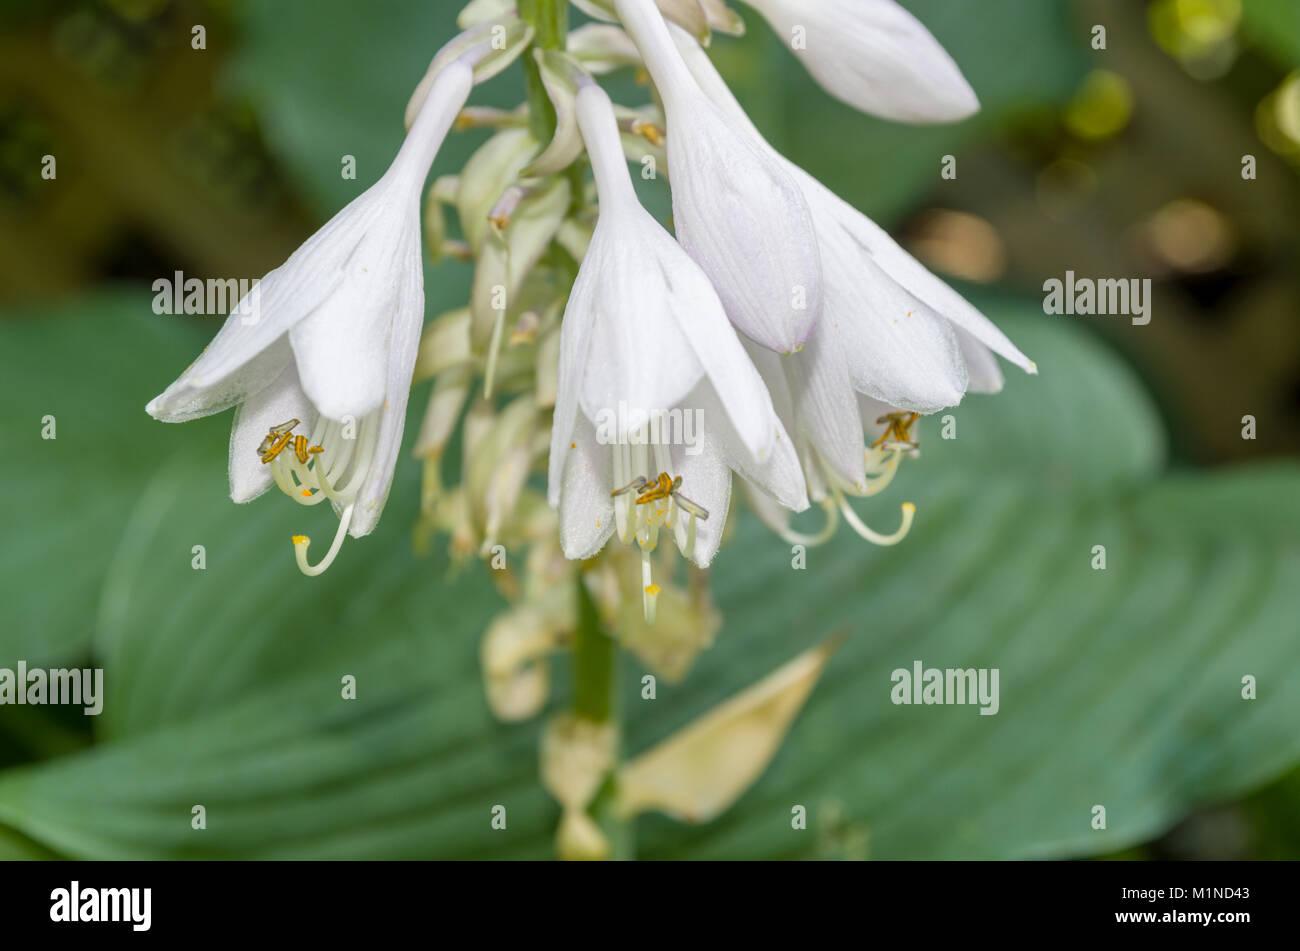 Hostas are broad leafed herbacious shade loving perennials. - Stock Image